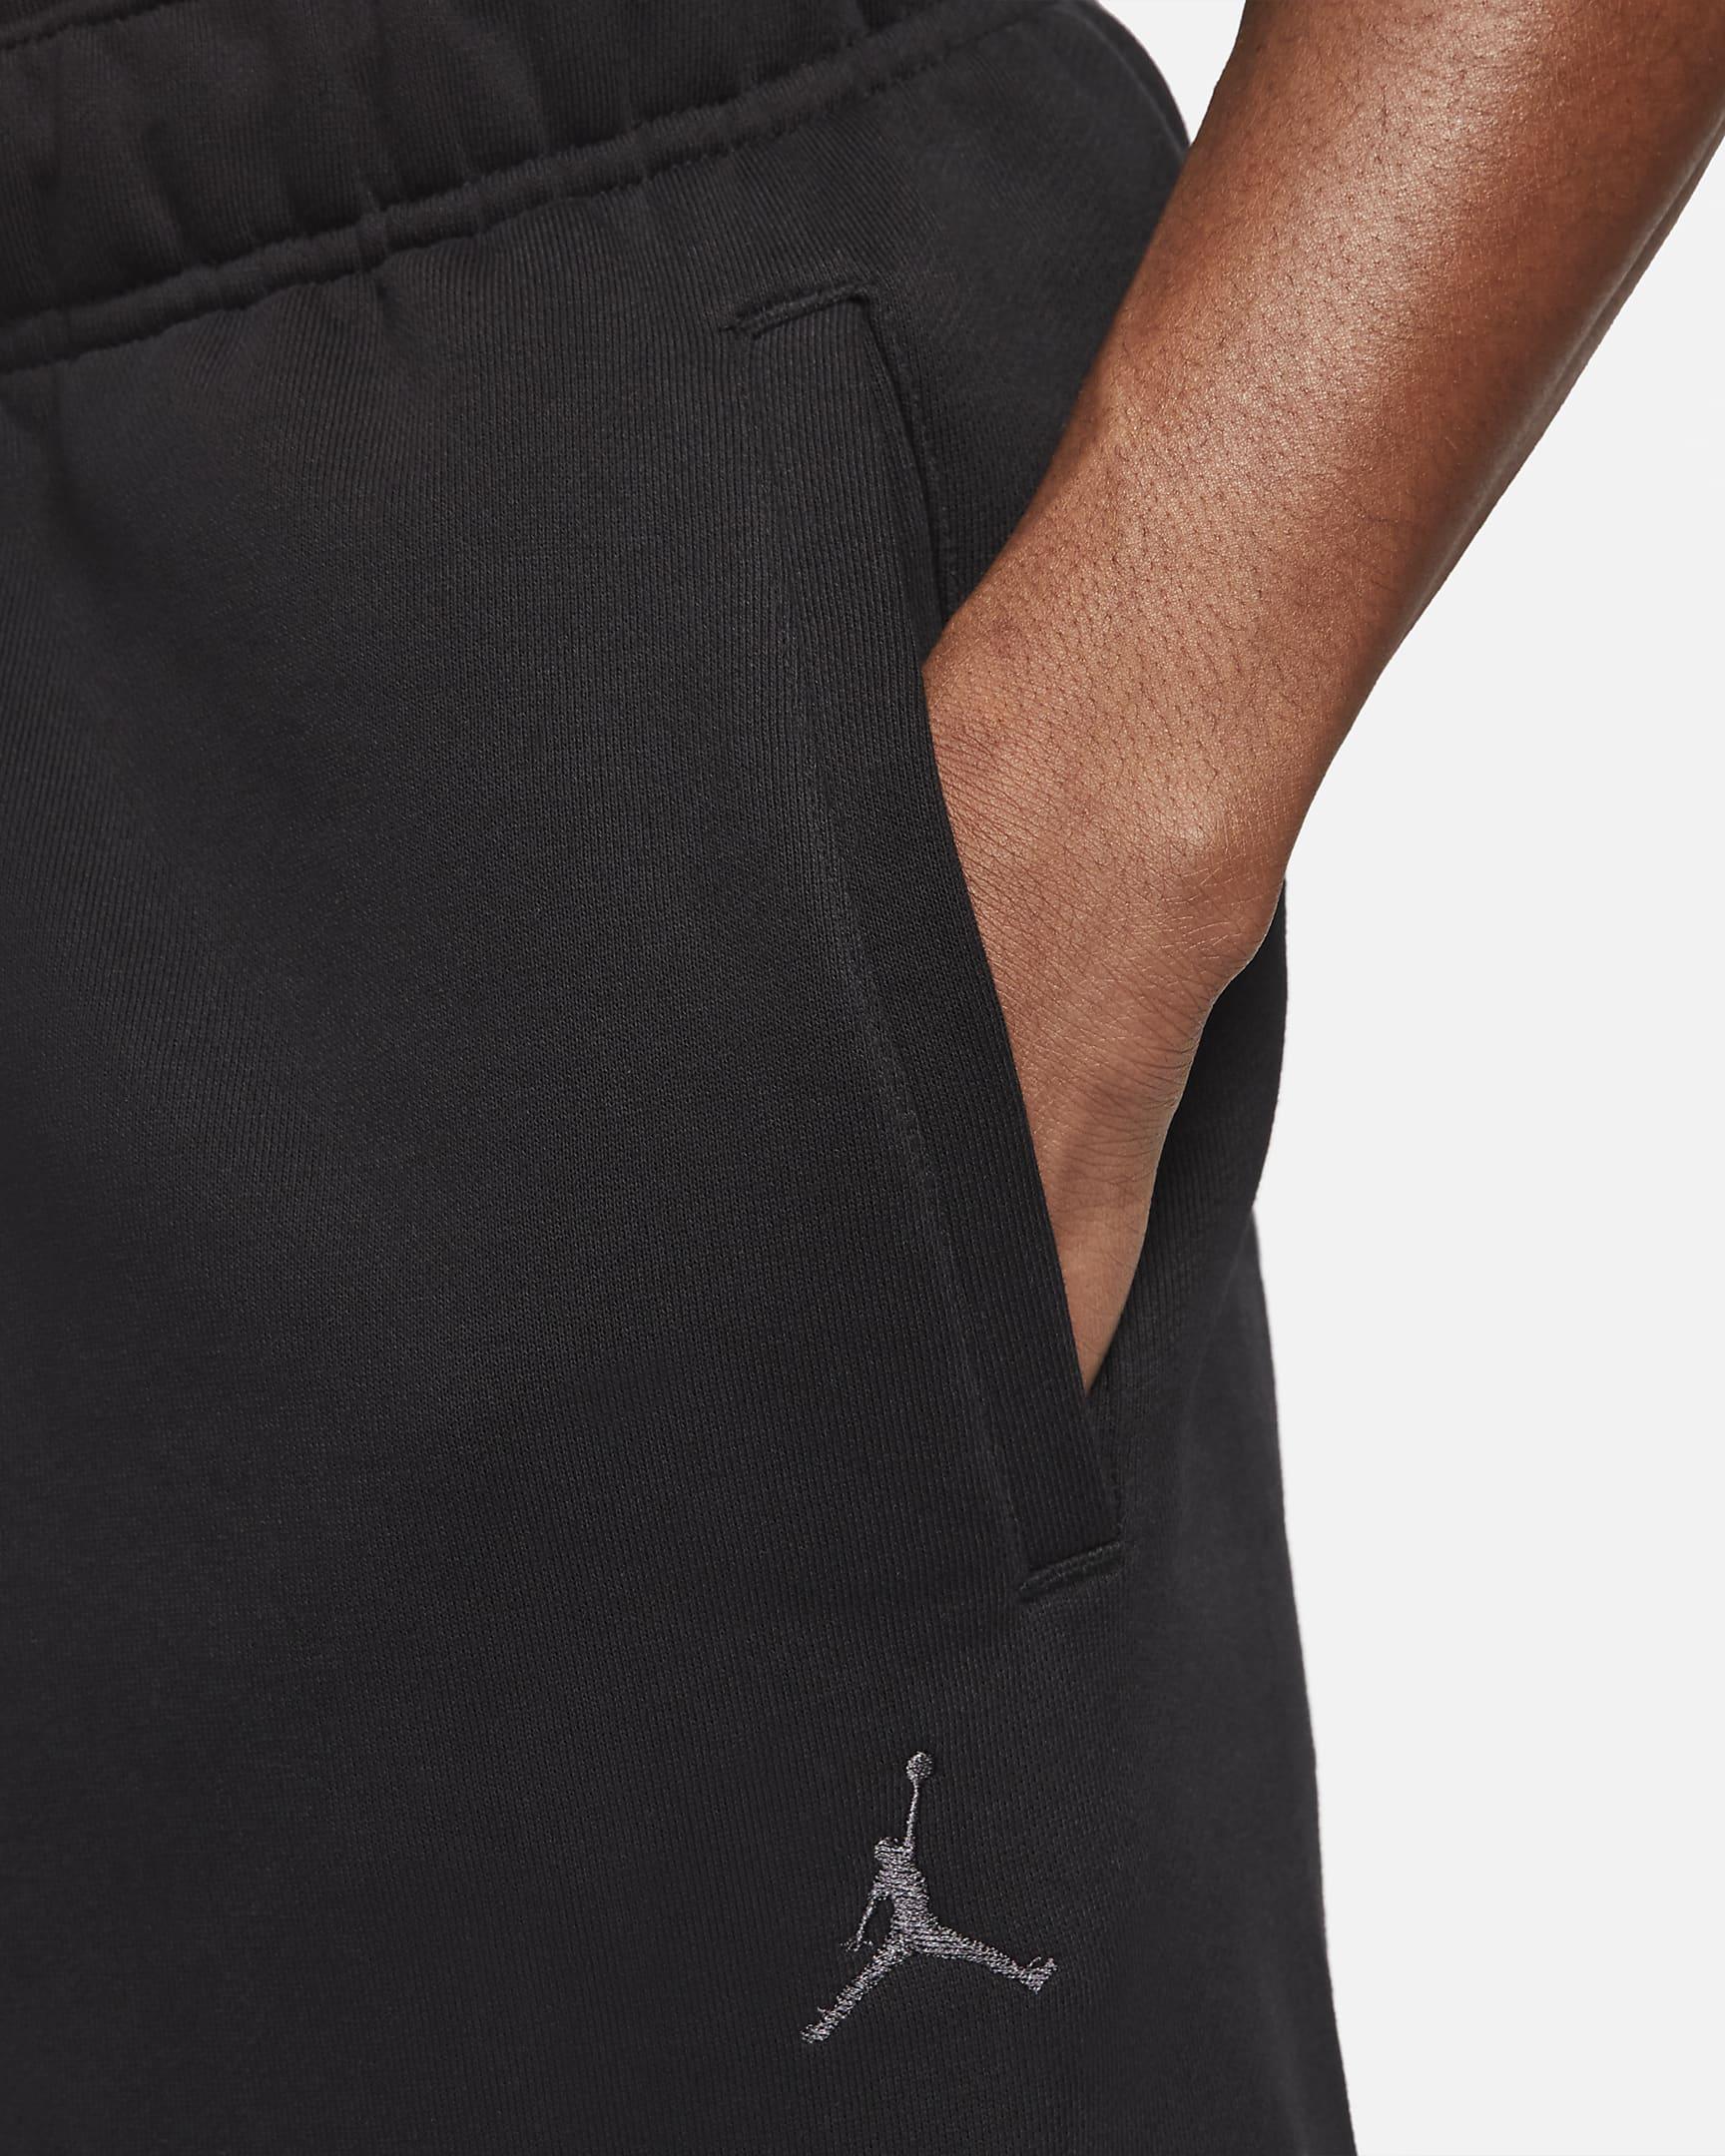 jordan-why-not-fleece-trousers-g30Kvc-4